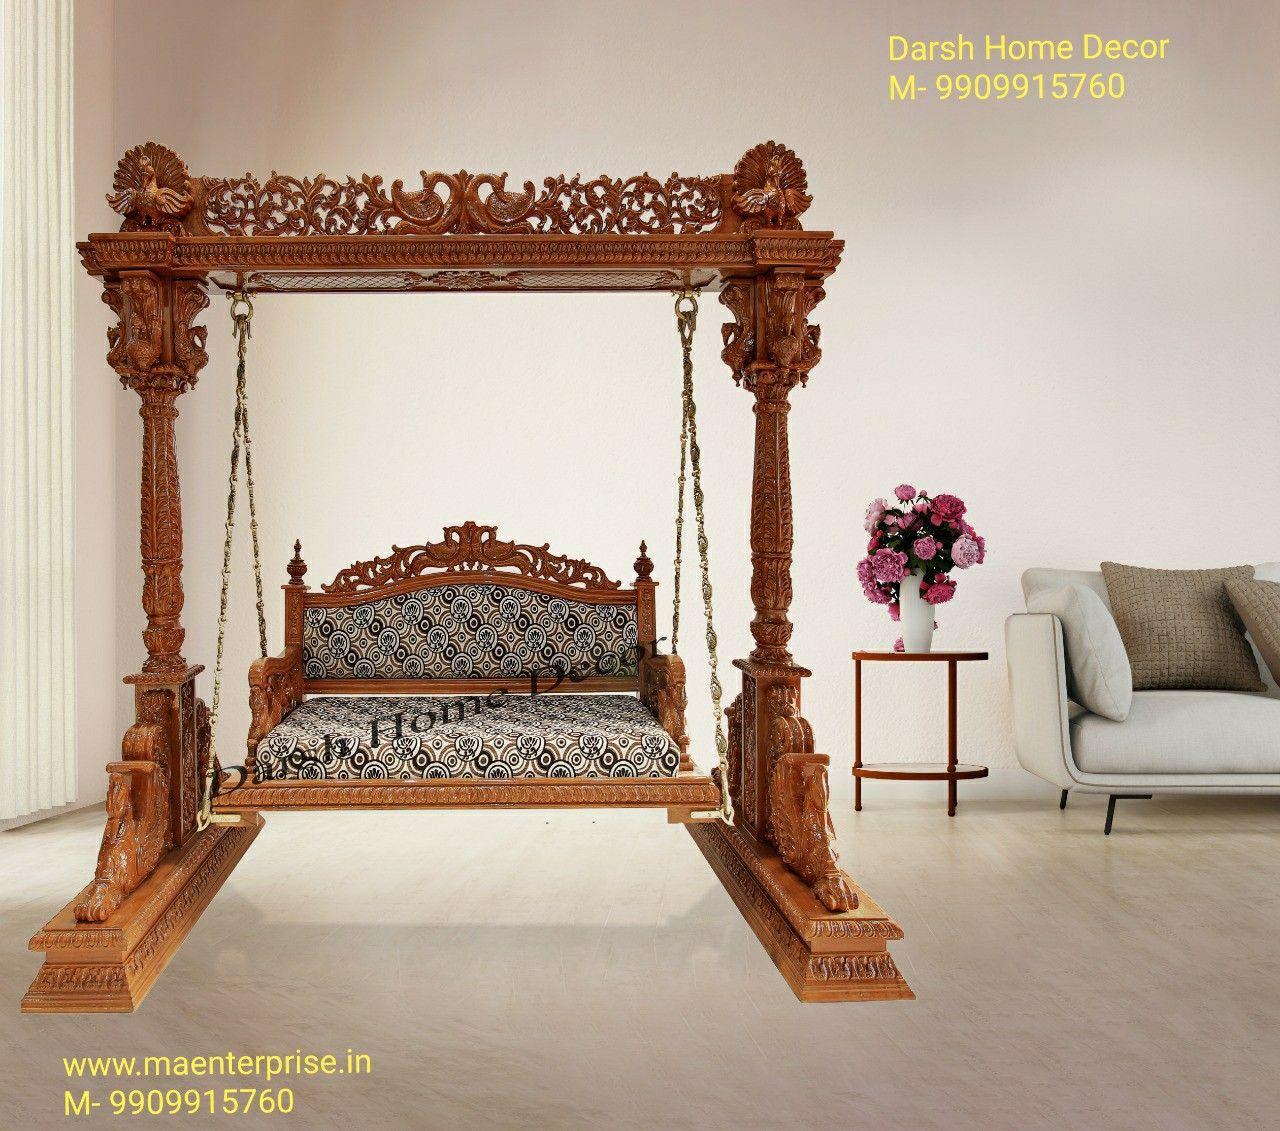 Pooja Mandir For Home Temple In India Usa Australia Ma Enterprise In 2020 Wooden Swings Room Swing Living Room Wood #swings #for #living #room #india